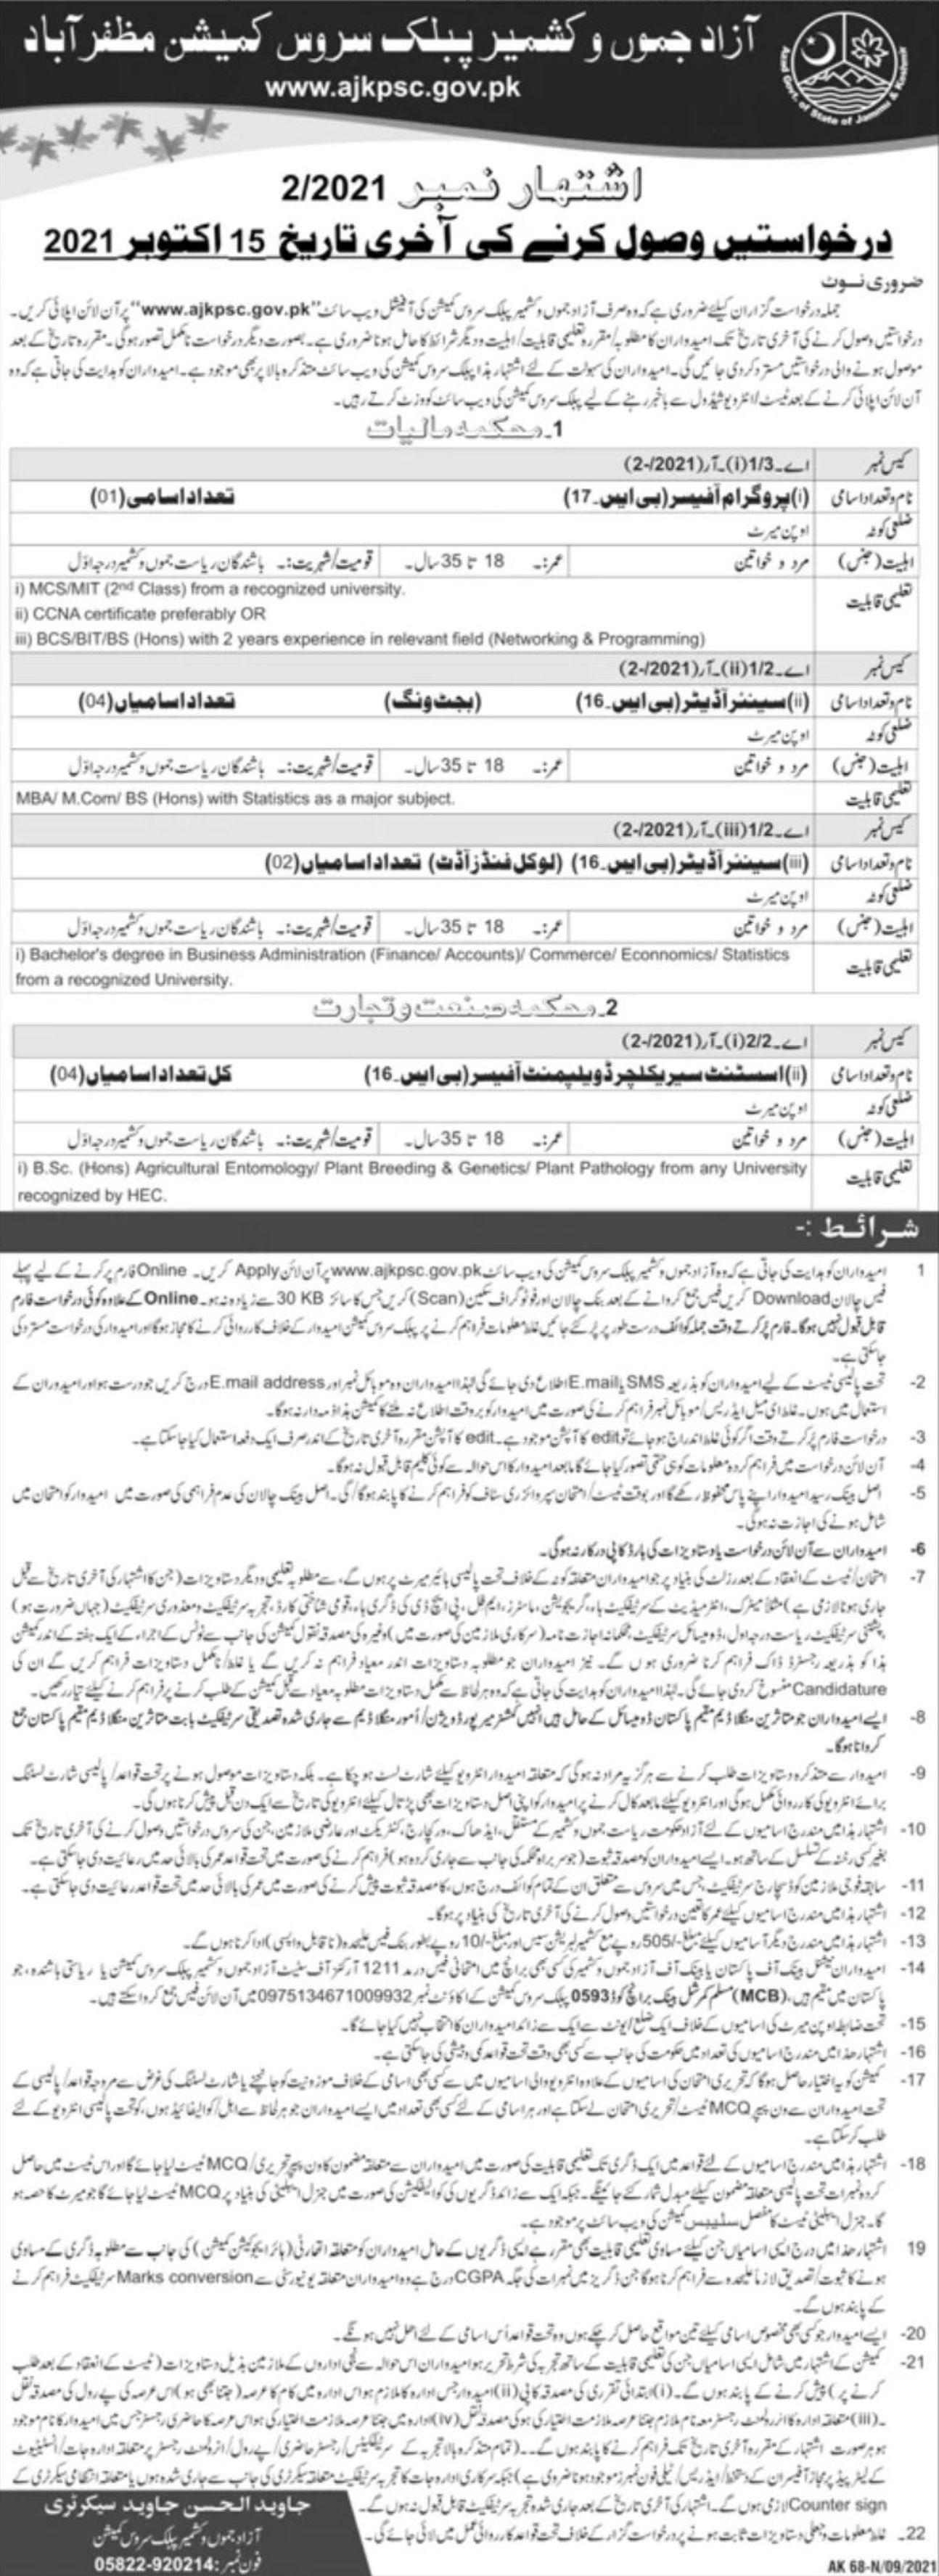 Azad Jammu & Kashmir Public Service Commission AJKPSC Vacancies 2021 – Latest Jobs 3